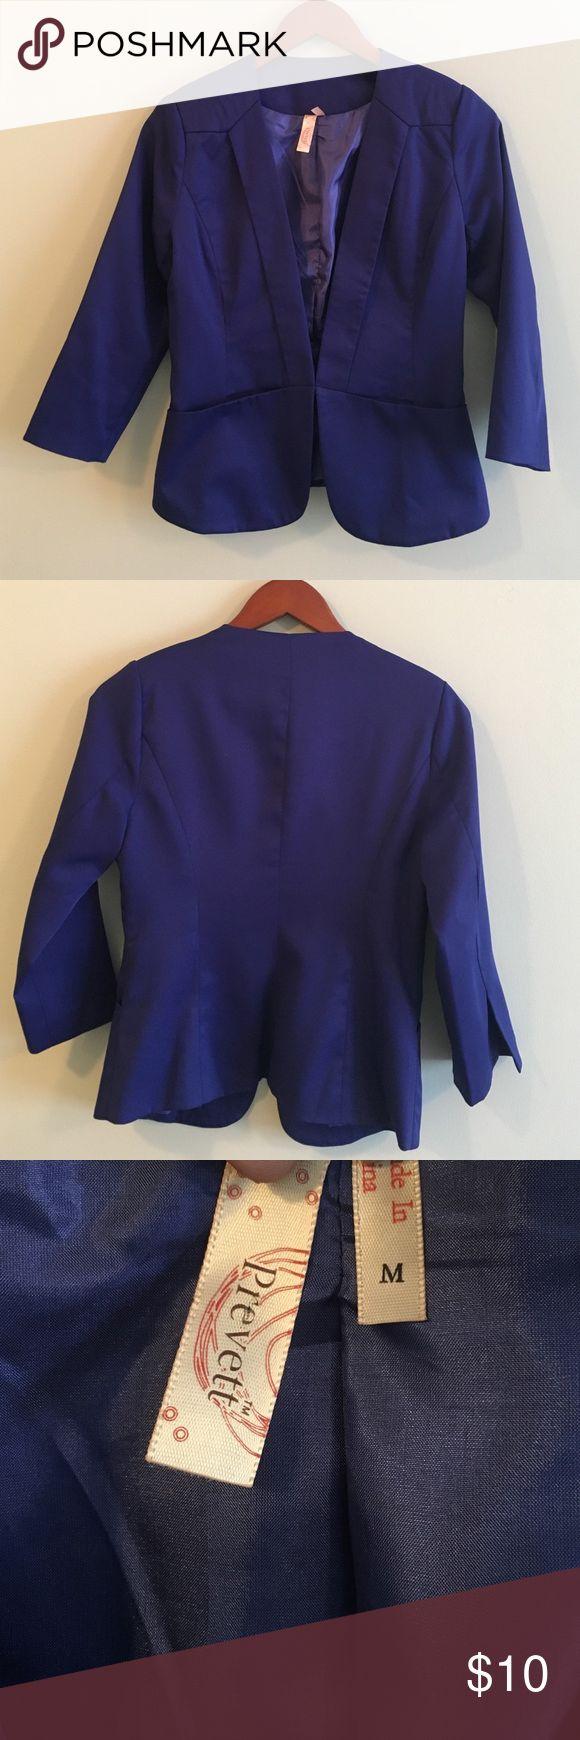 3/4 length sleeve royal blue blazer. Royal blue blazer. 3/4 length sleeve. Size medium. Hook and eye closure. Front pockets. Francesca's Collections Jackets & Coats Blazers